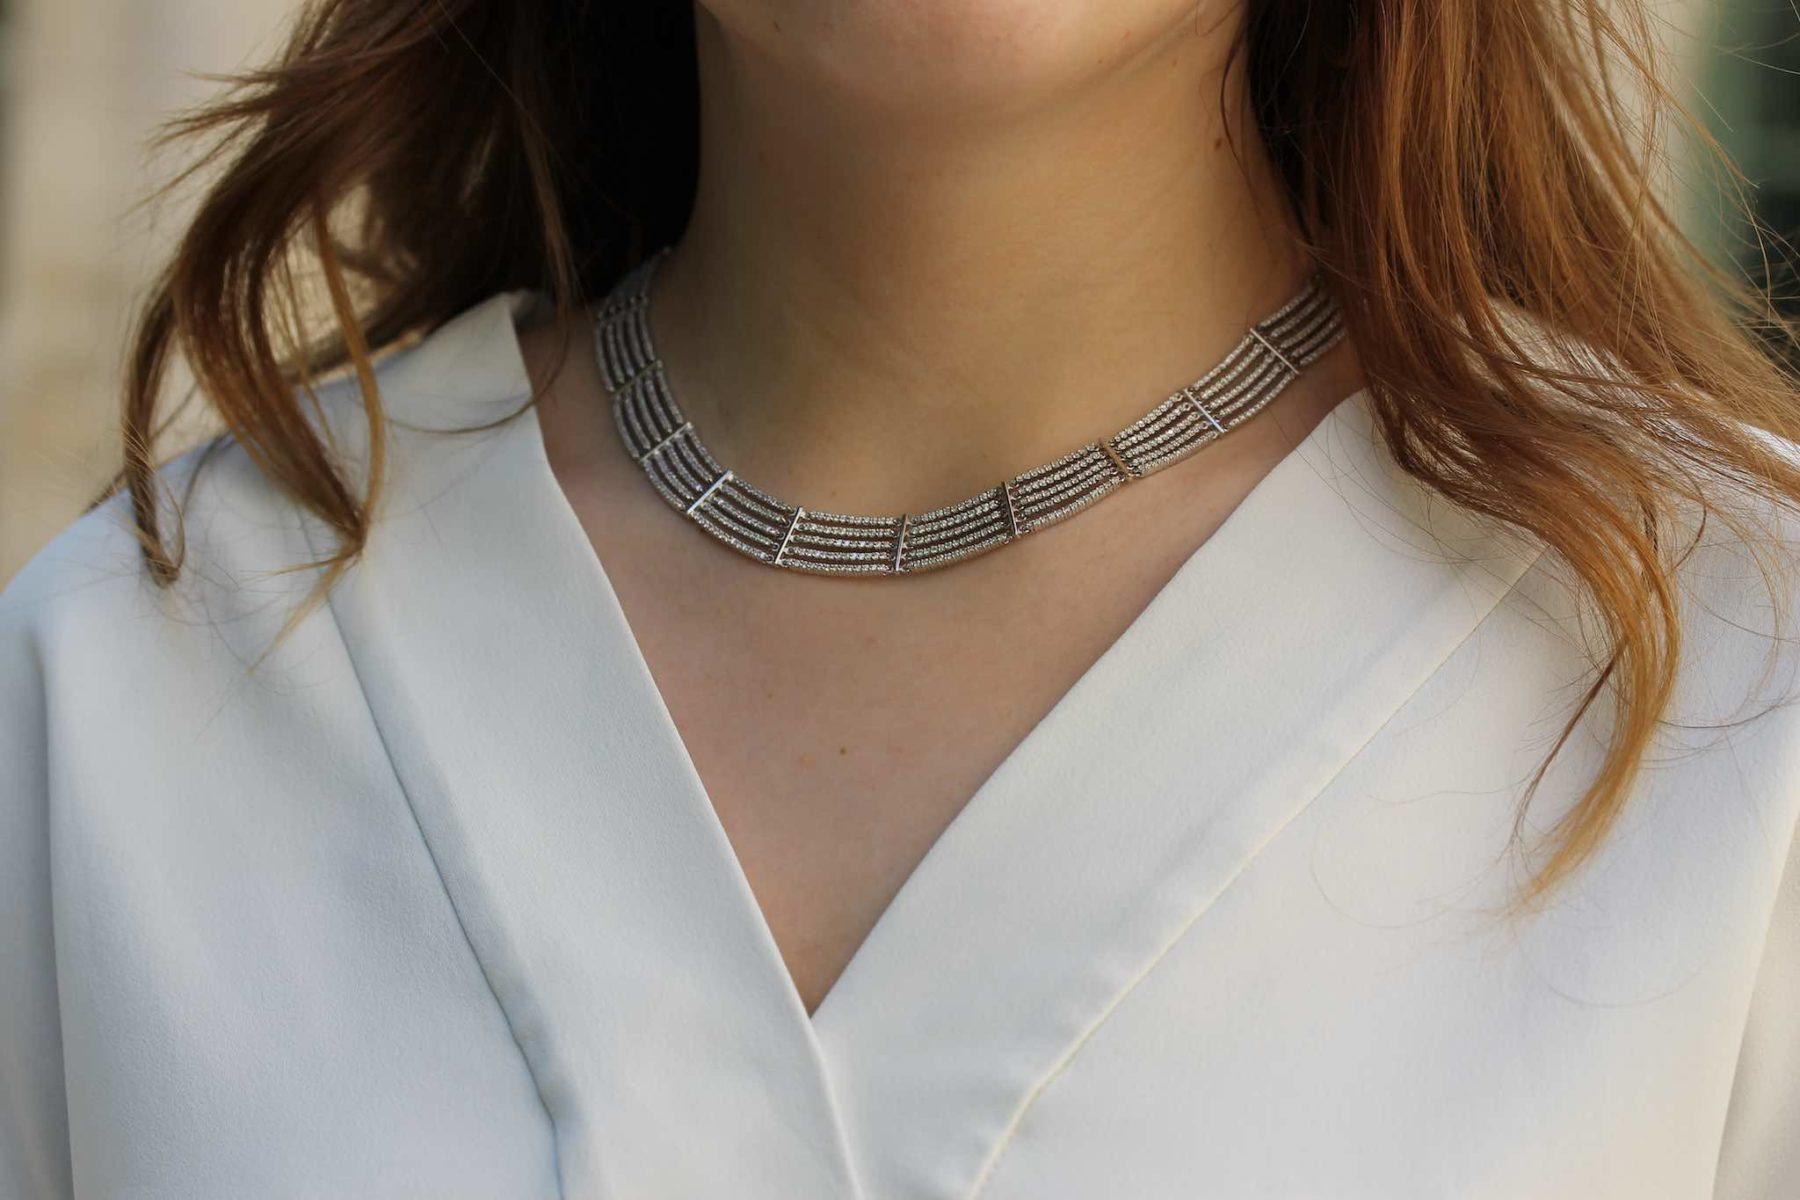 Collier articulé pavé de diamants en or blanc 18k